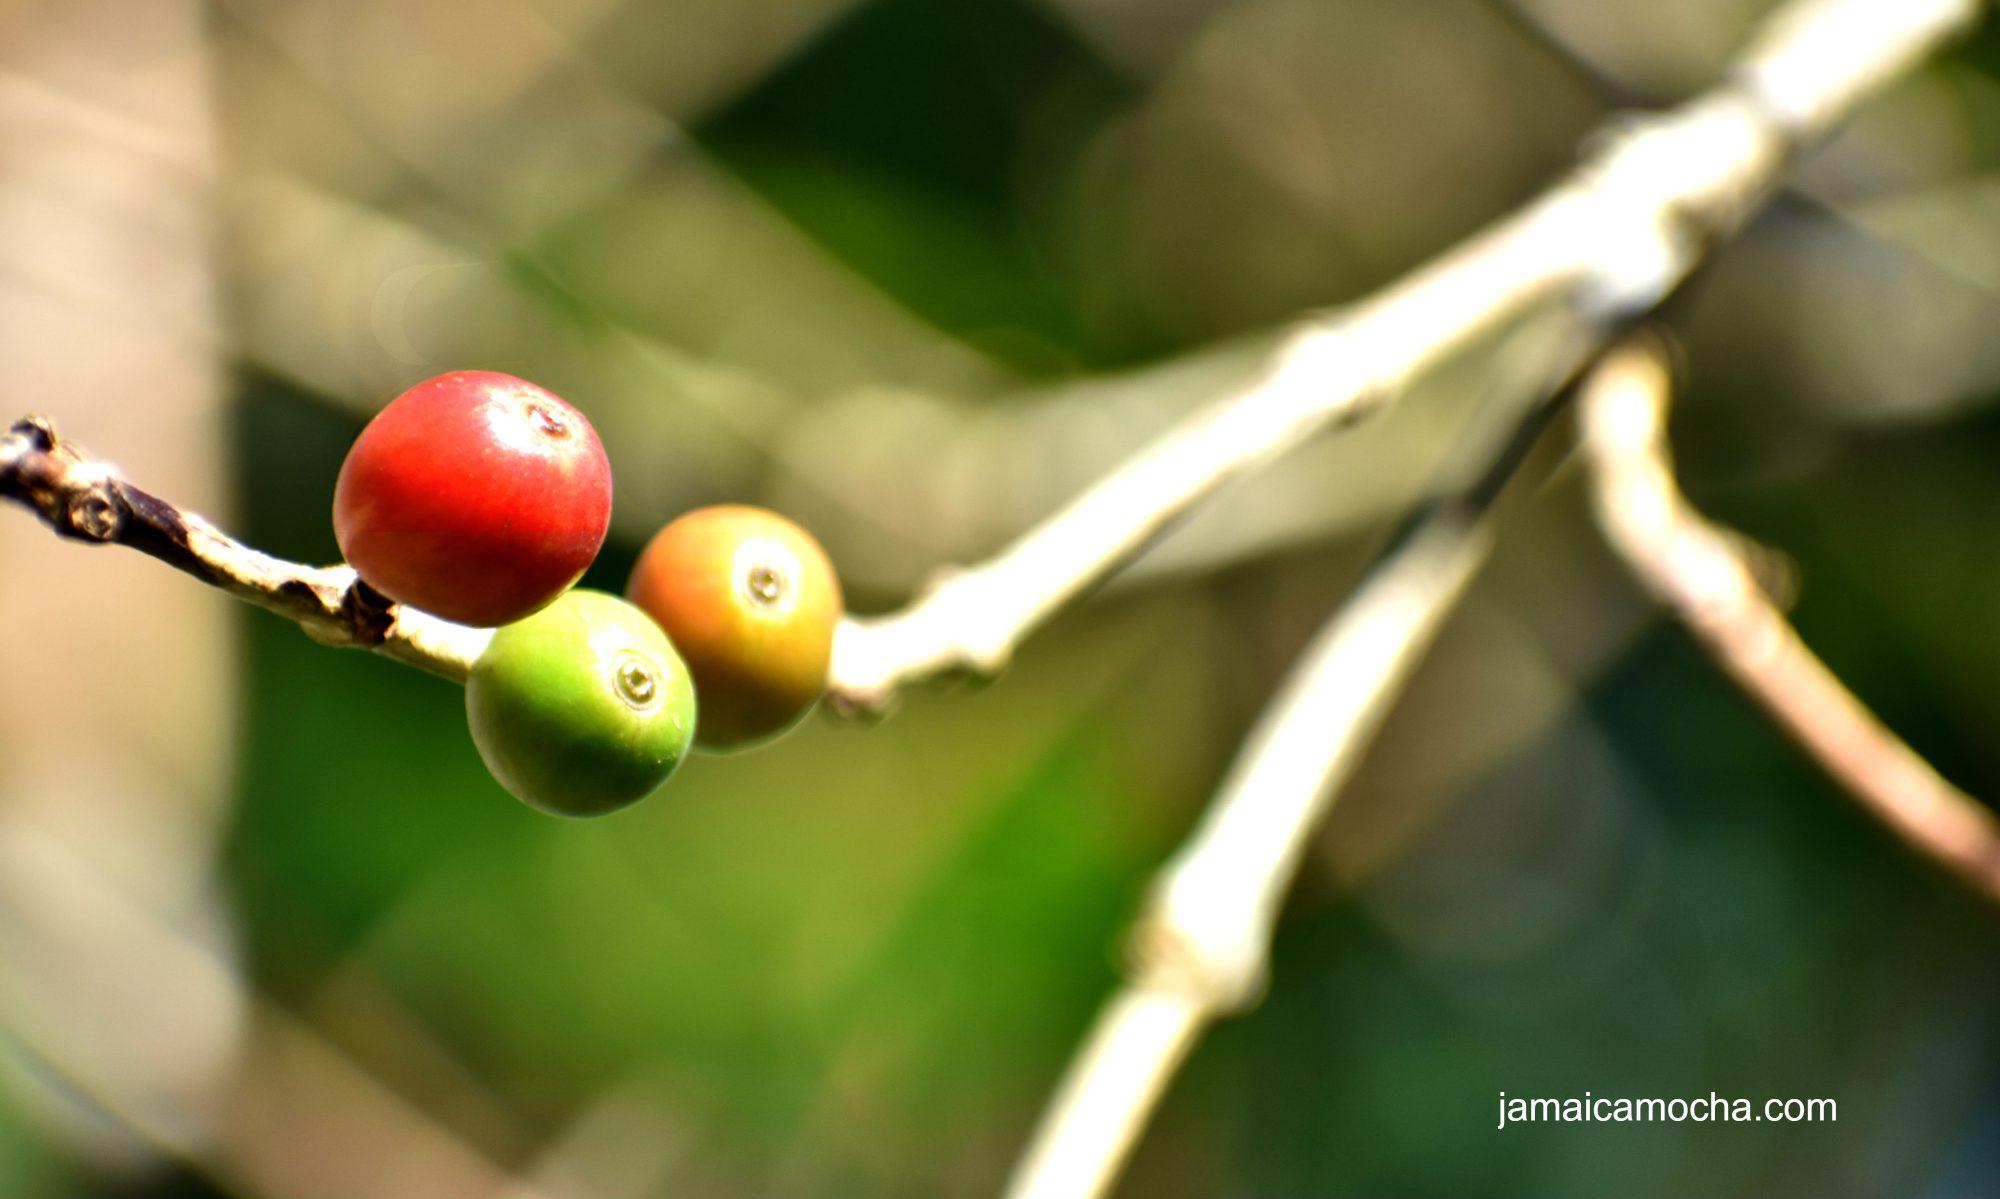 jamaicamocha